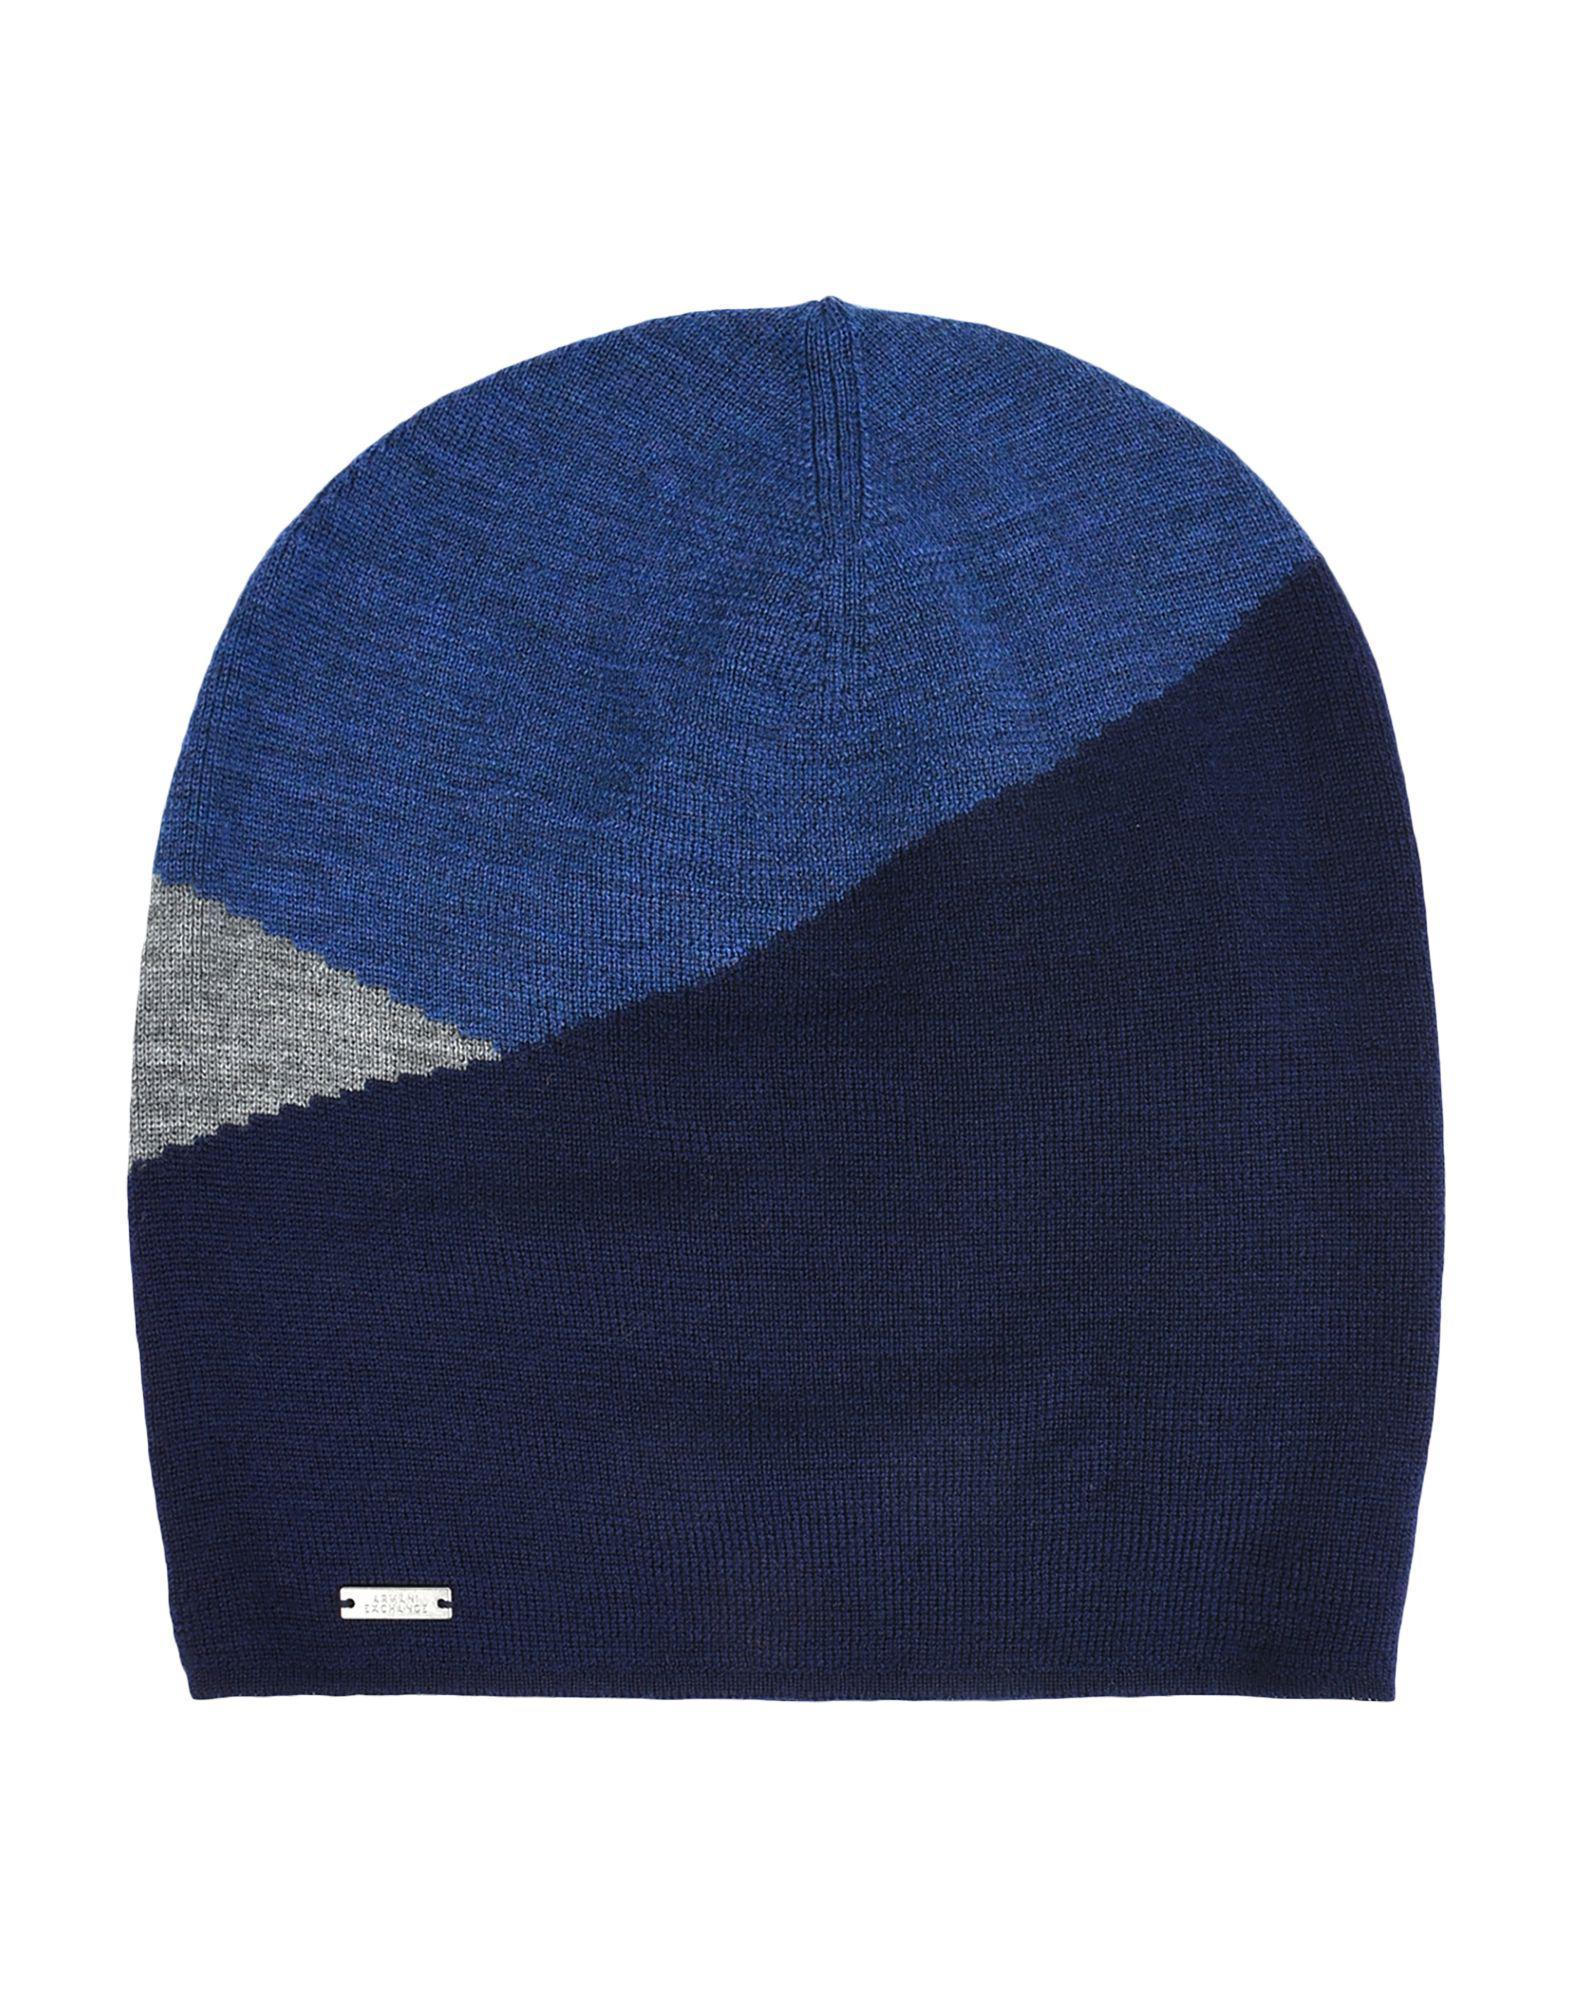 6e2cd3caf42 Lyst - Armani Exchange Hats in Blue for Men